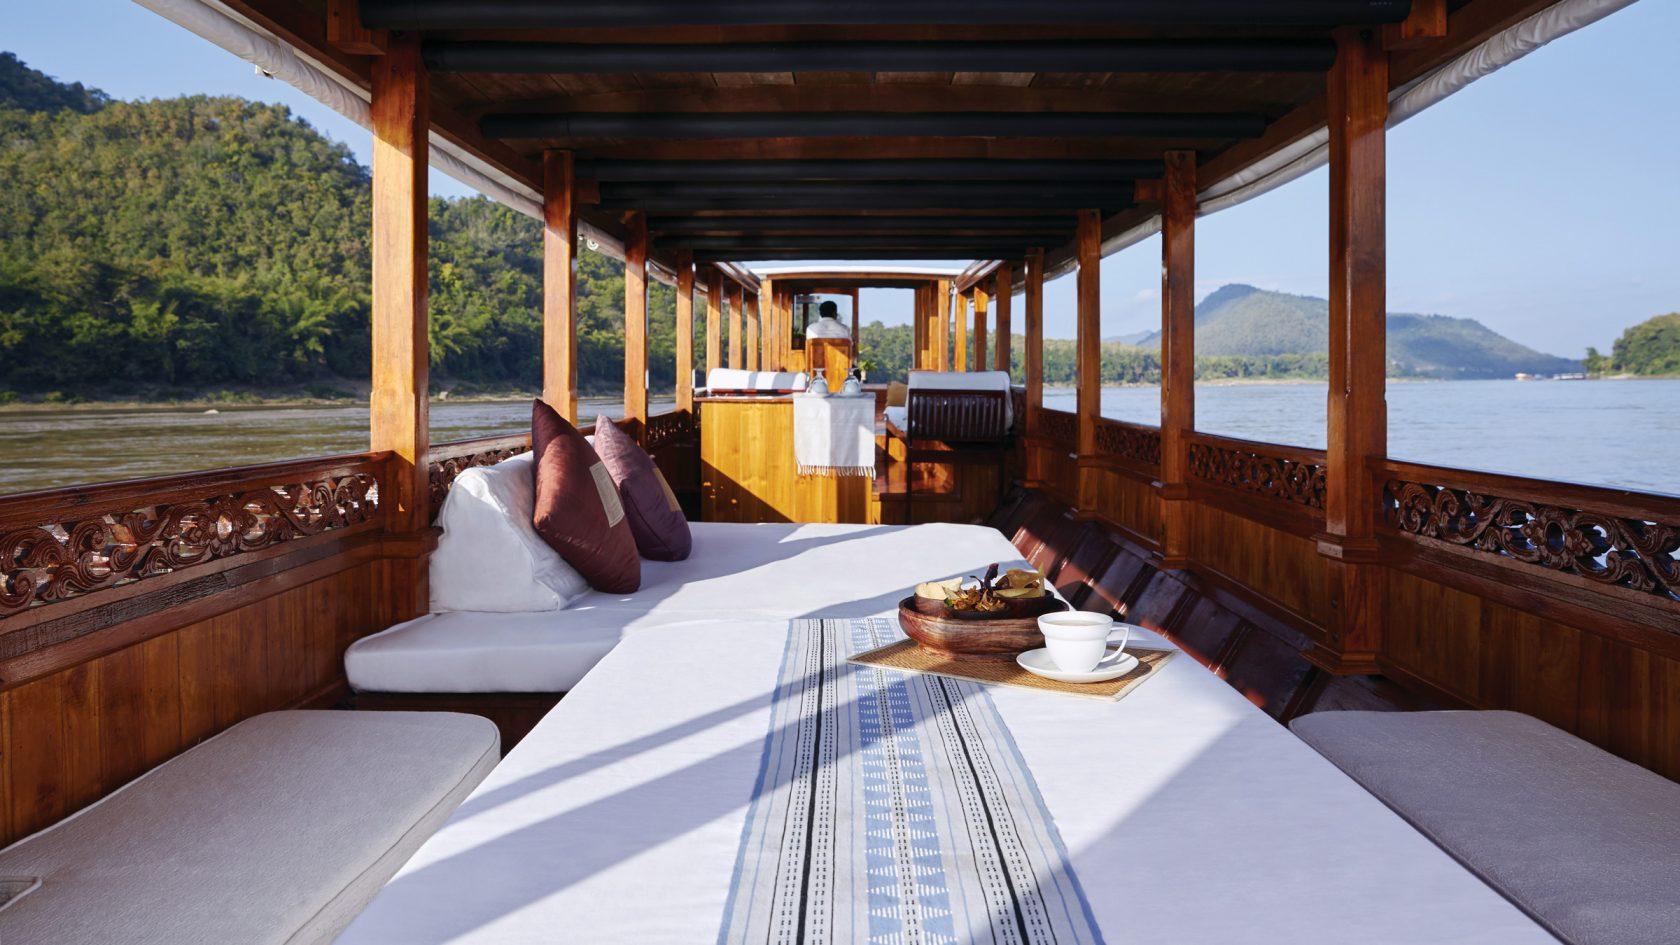 Luxushotels buchen – Belmond Hotels, Trains and River Cruises